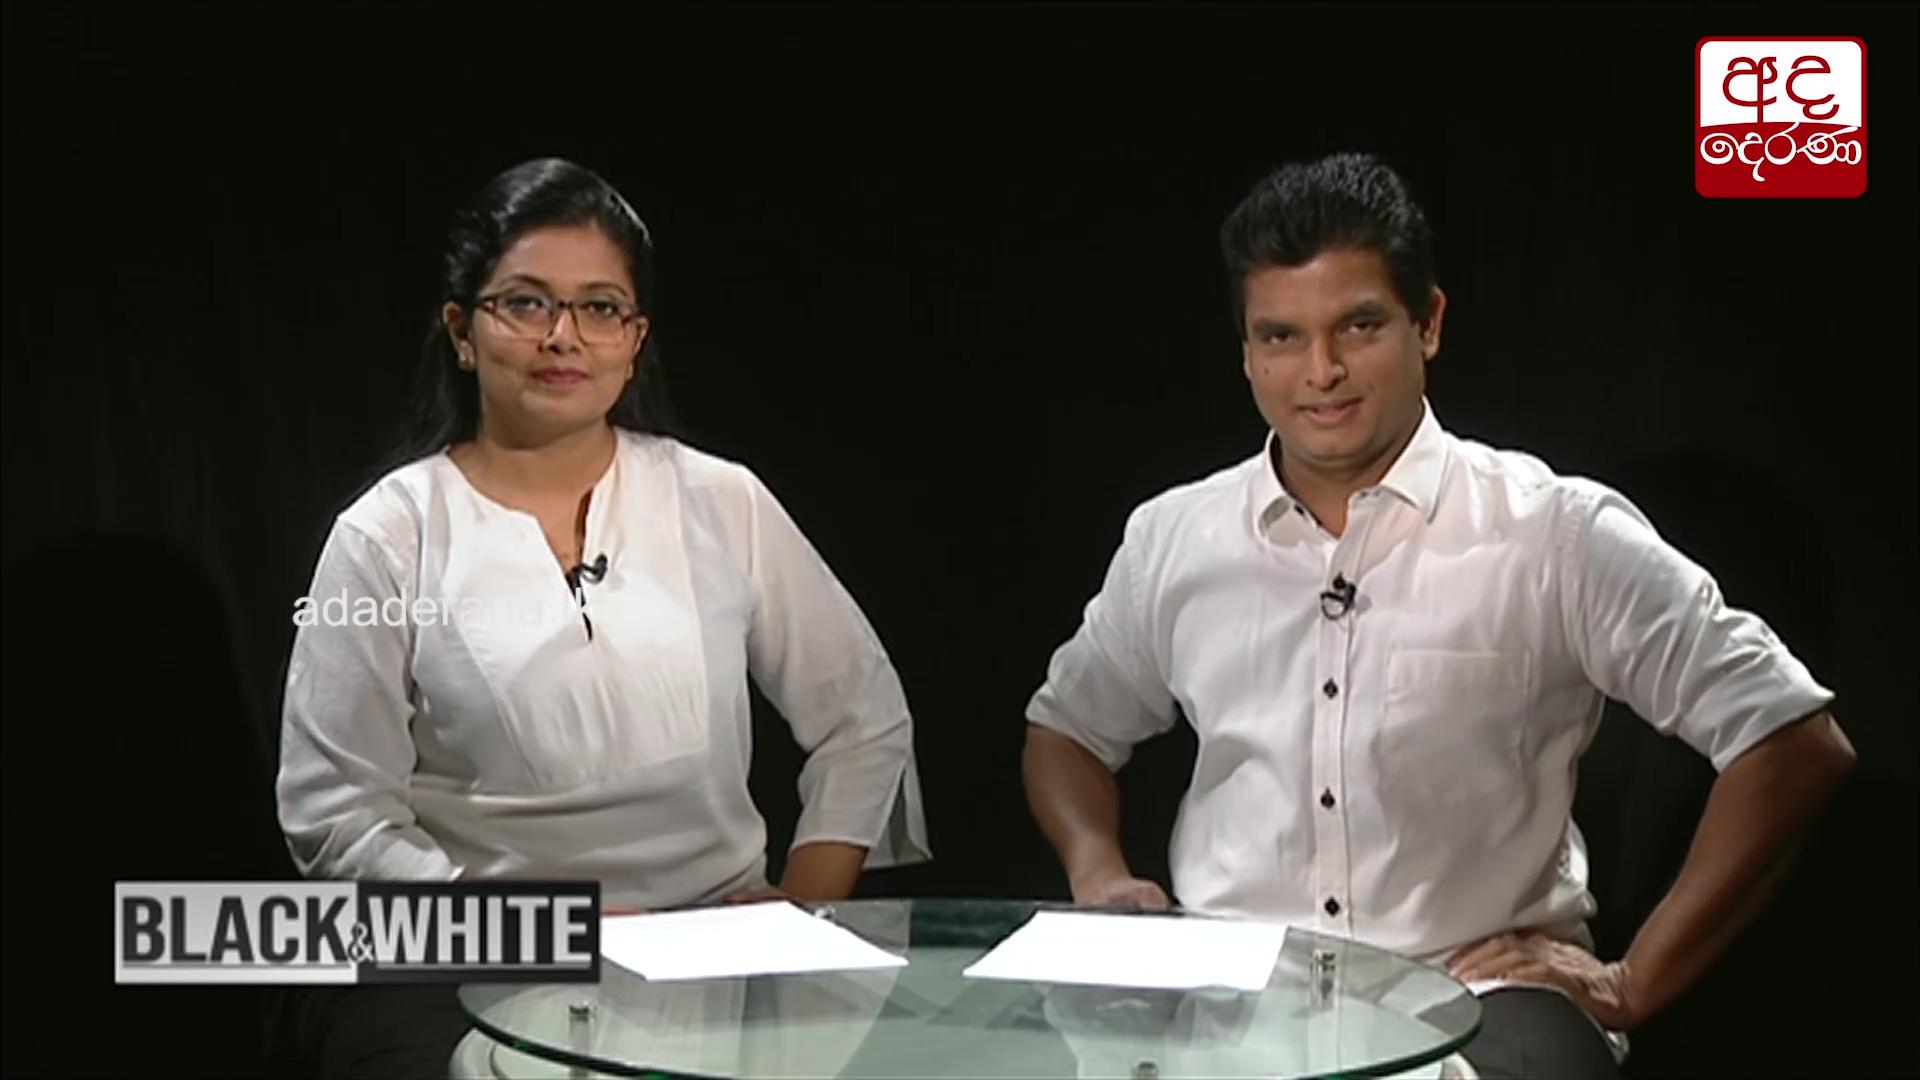 Ada Derana Black & White - 2019.12.06